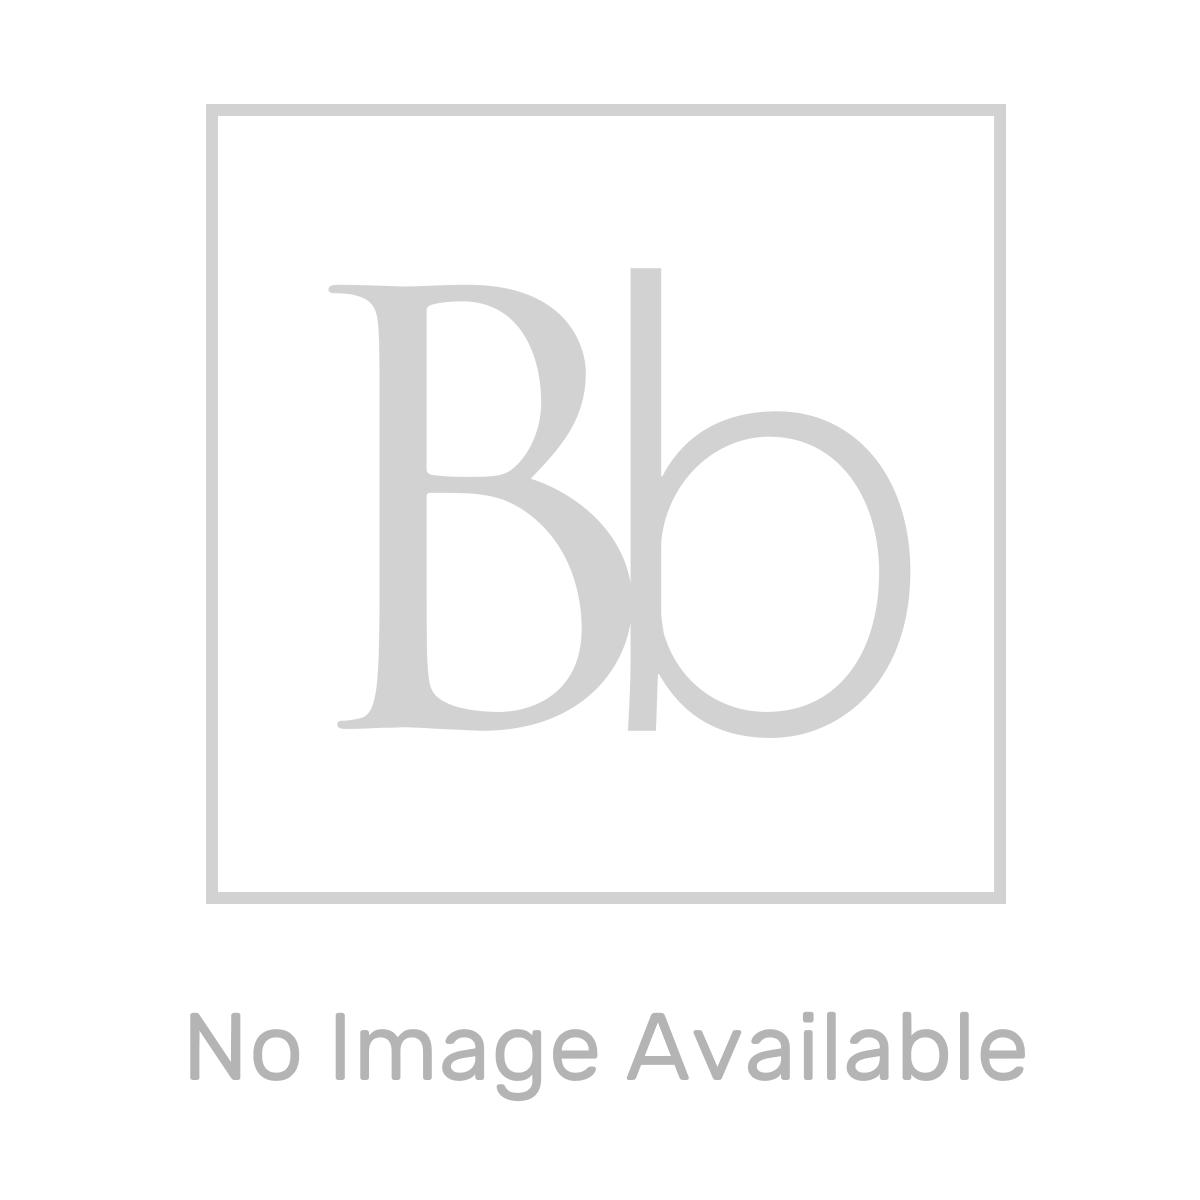 Aquadart White Slate Shower Tray 1500 x 700 Dimension